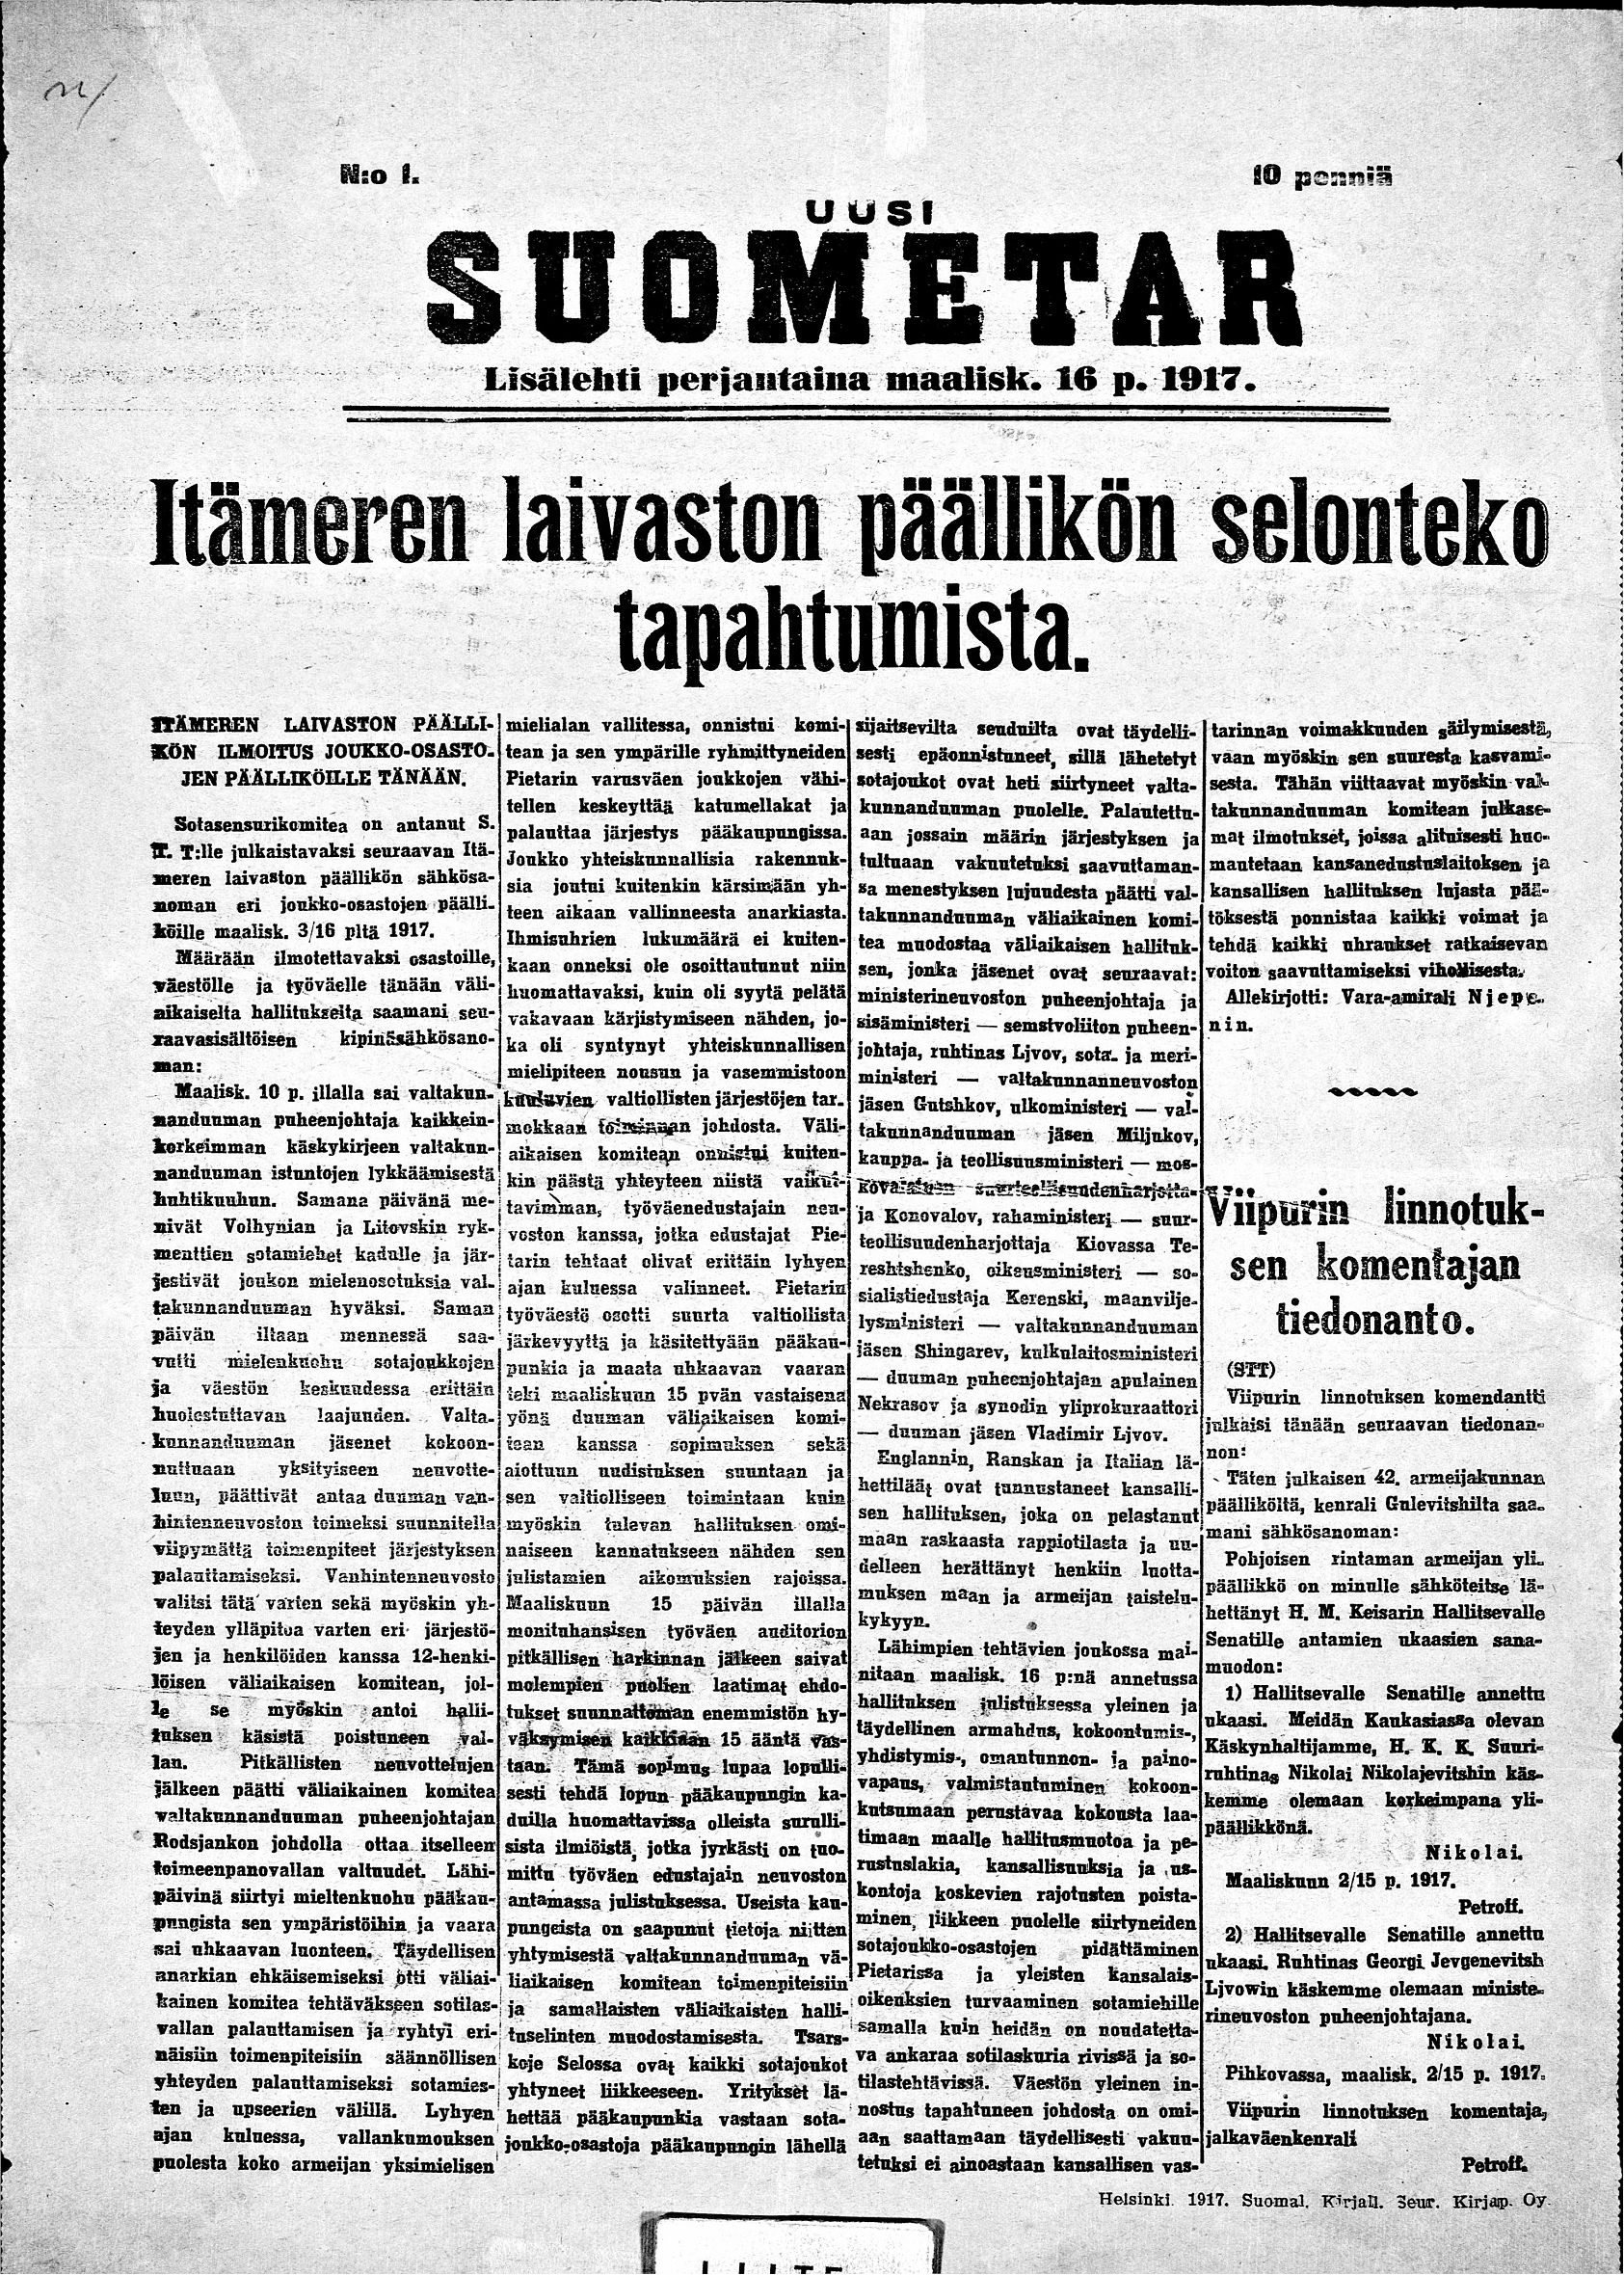 Uusi Suometar_16.3.1917